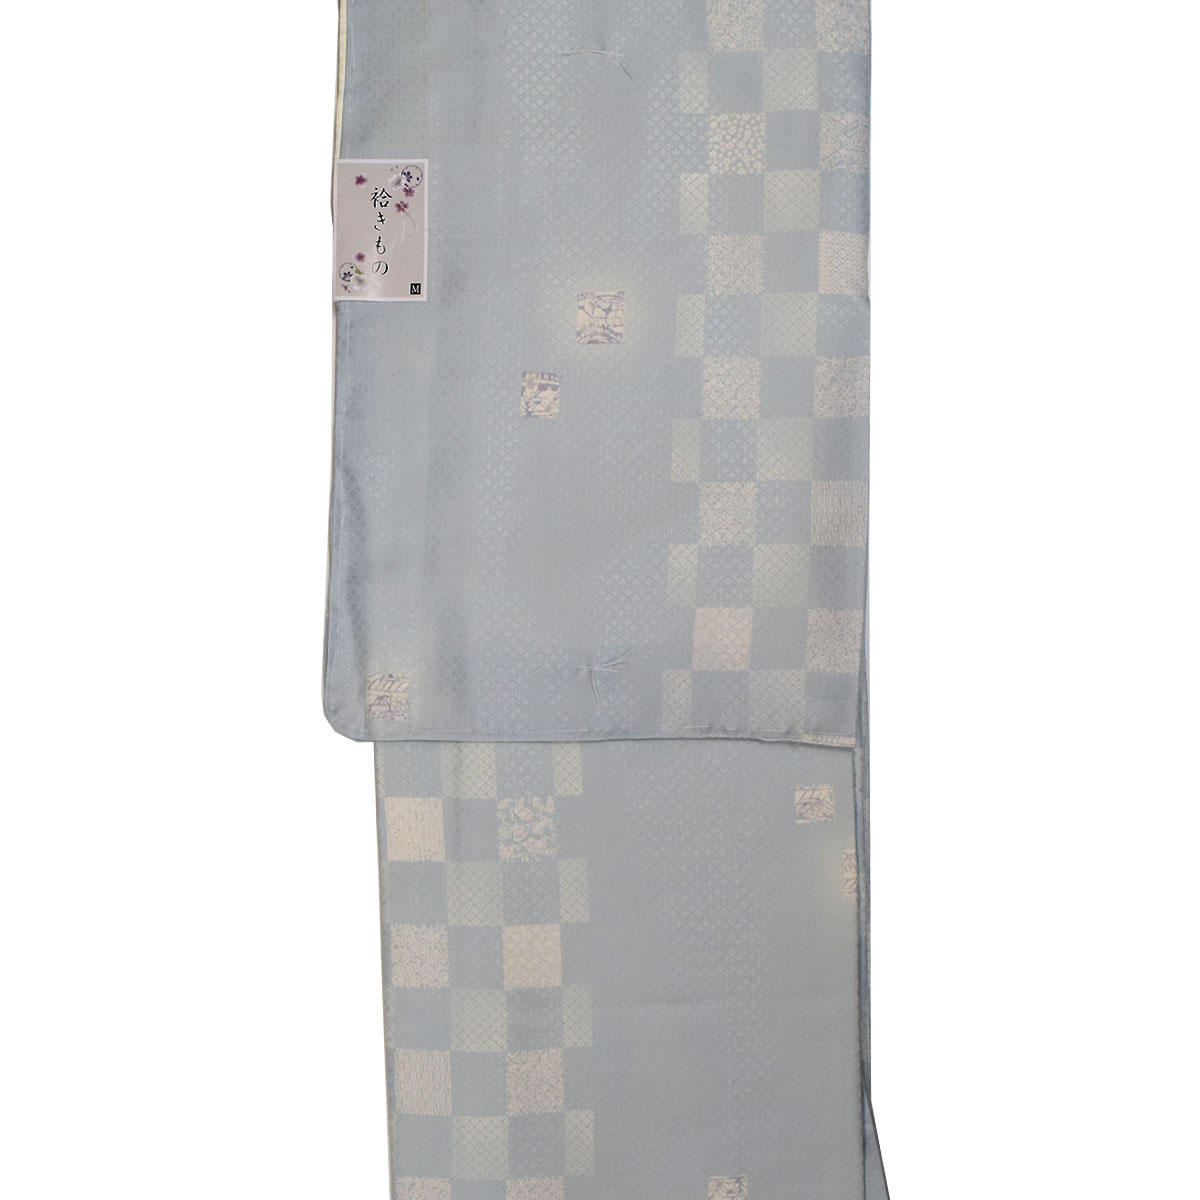 【L寸】 上質生地 仕立て上がり 袷 洗える着物 【単品】番号c902-89 kimono washable